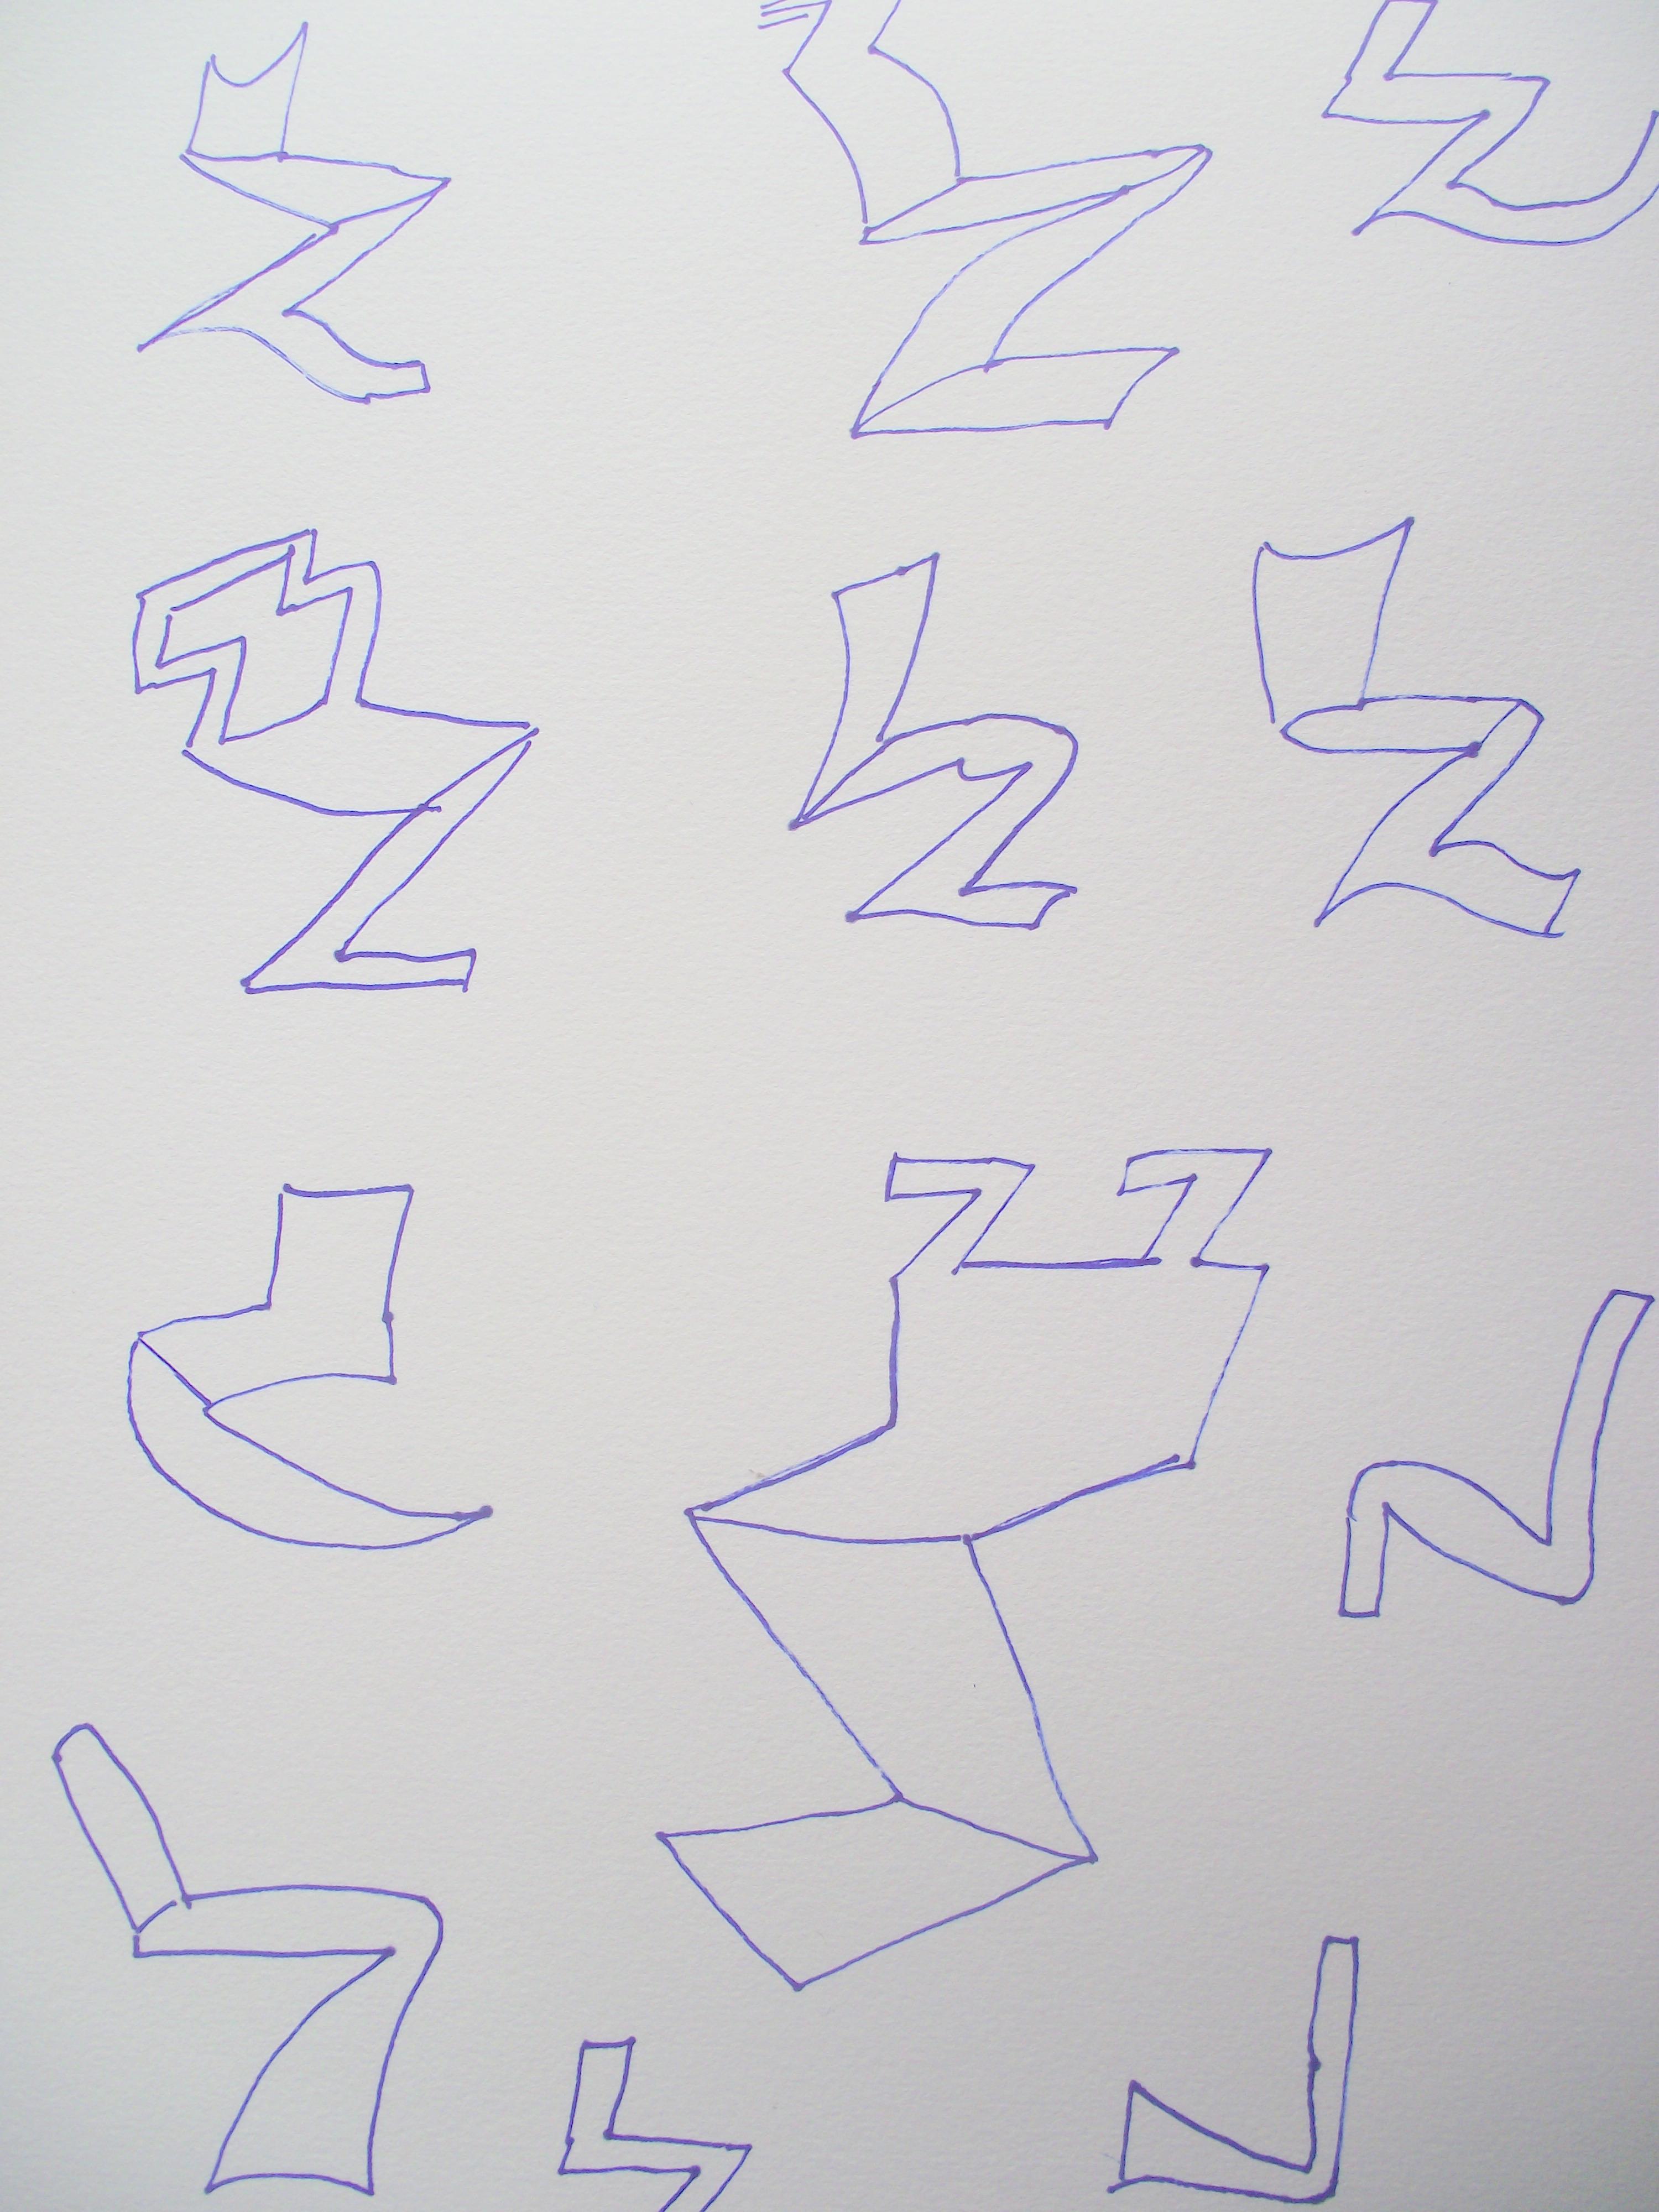 Zig zag stoel designblog for Design stuhl zig zag